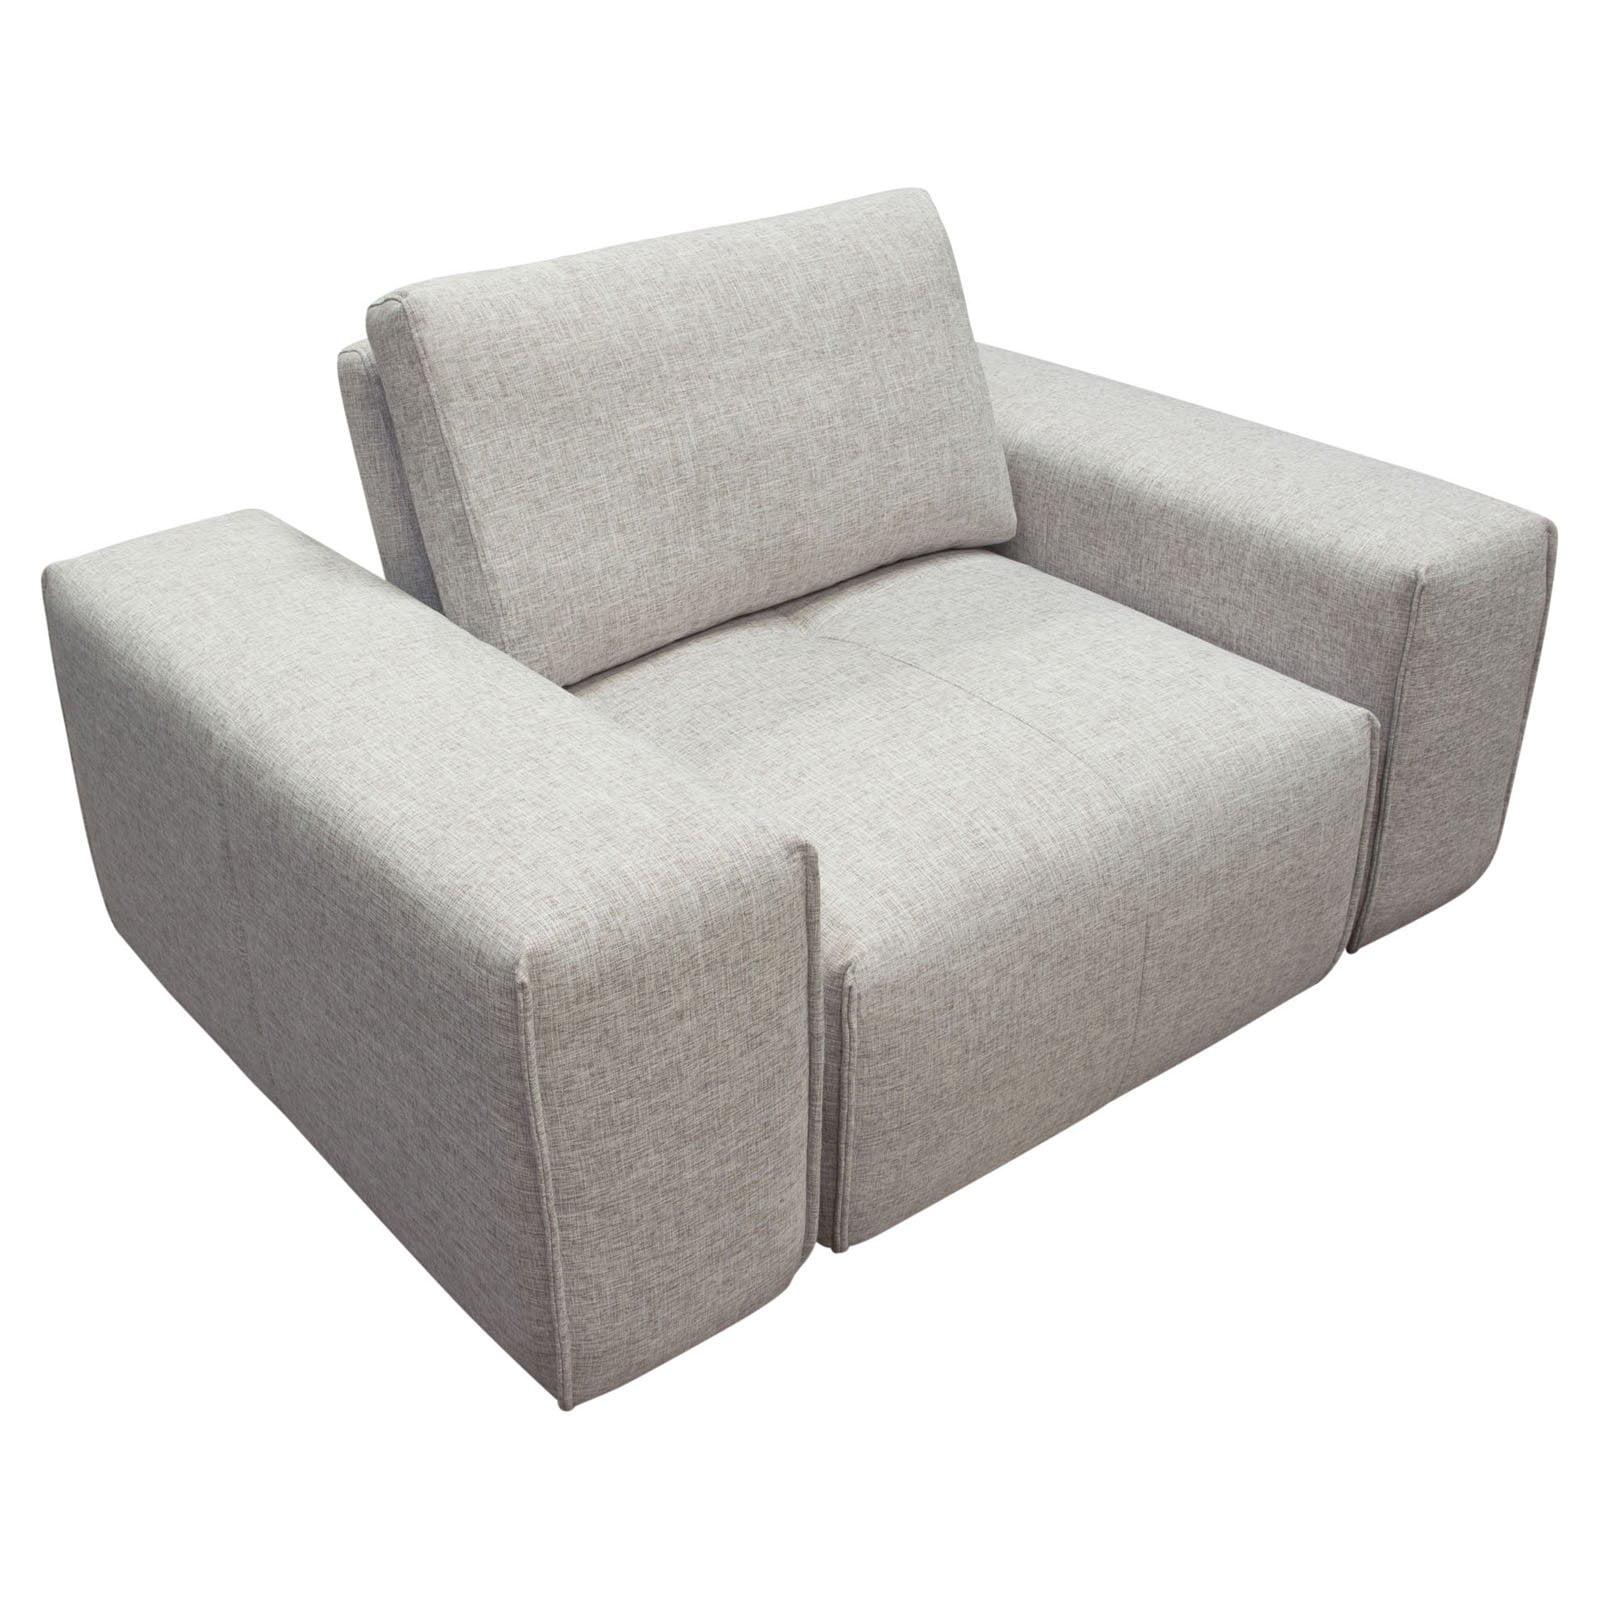 Diamond Sofa Jazz Modular Arm Chair with Adjustable Backrest - Light Brown